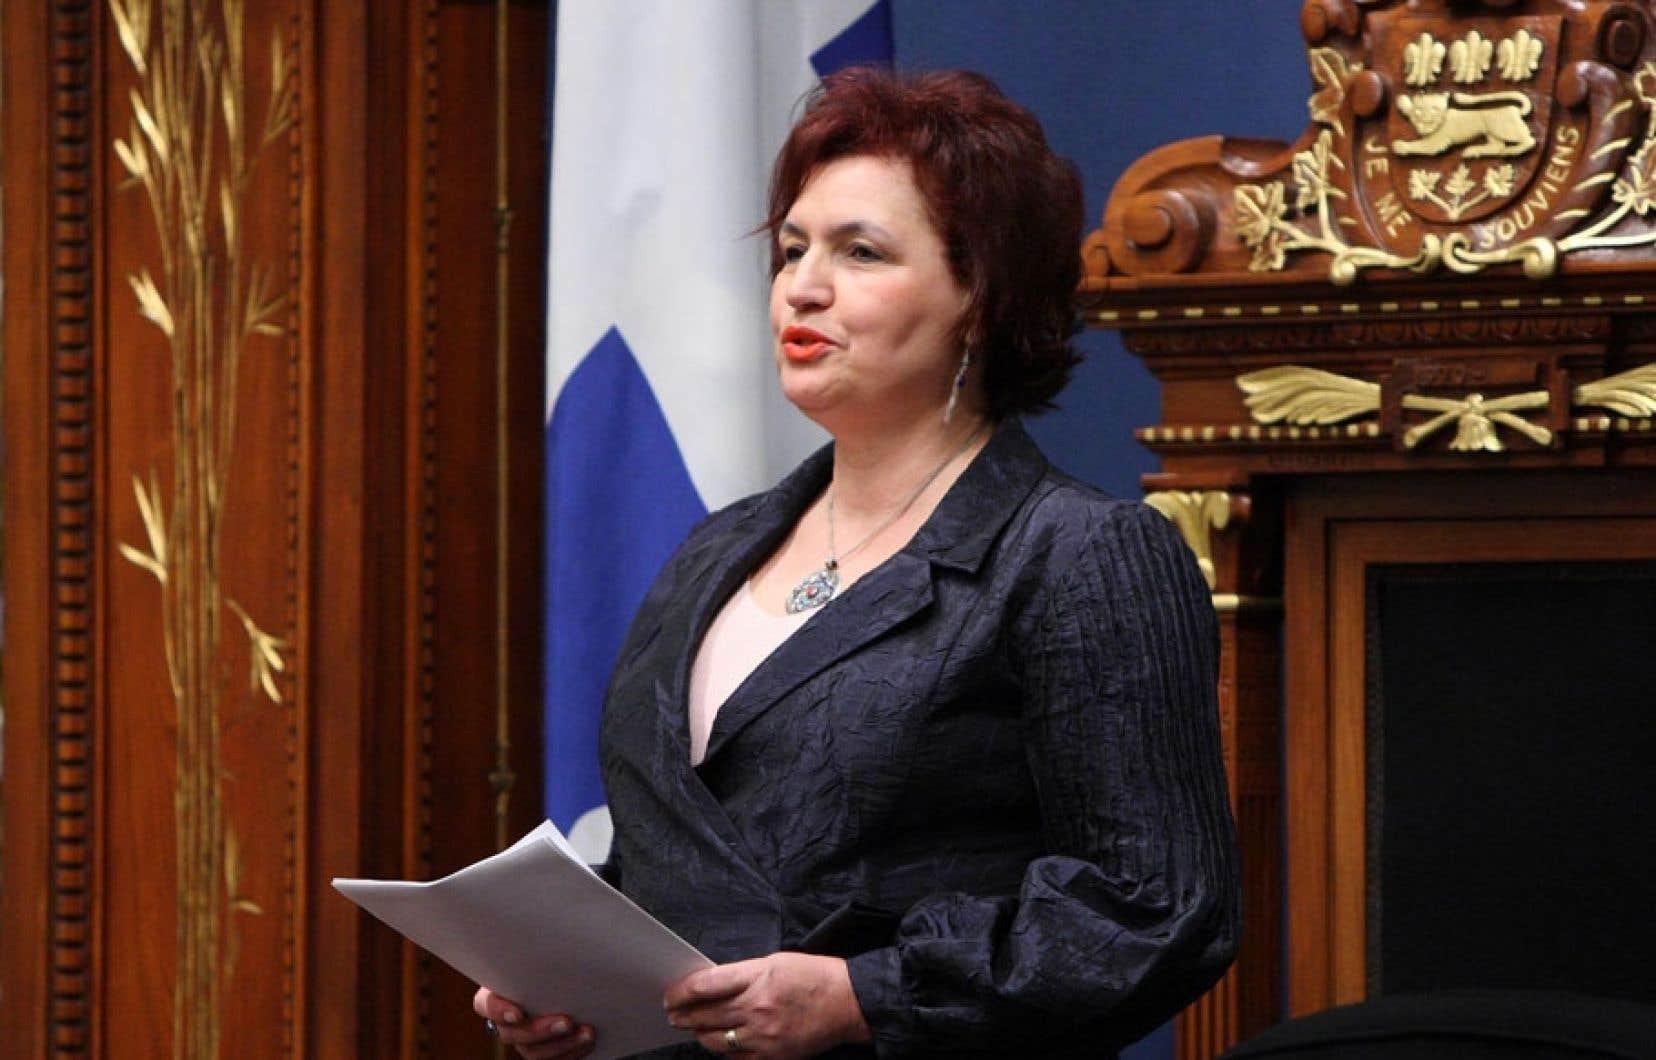 Fatima Houda-Pépin